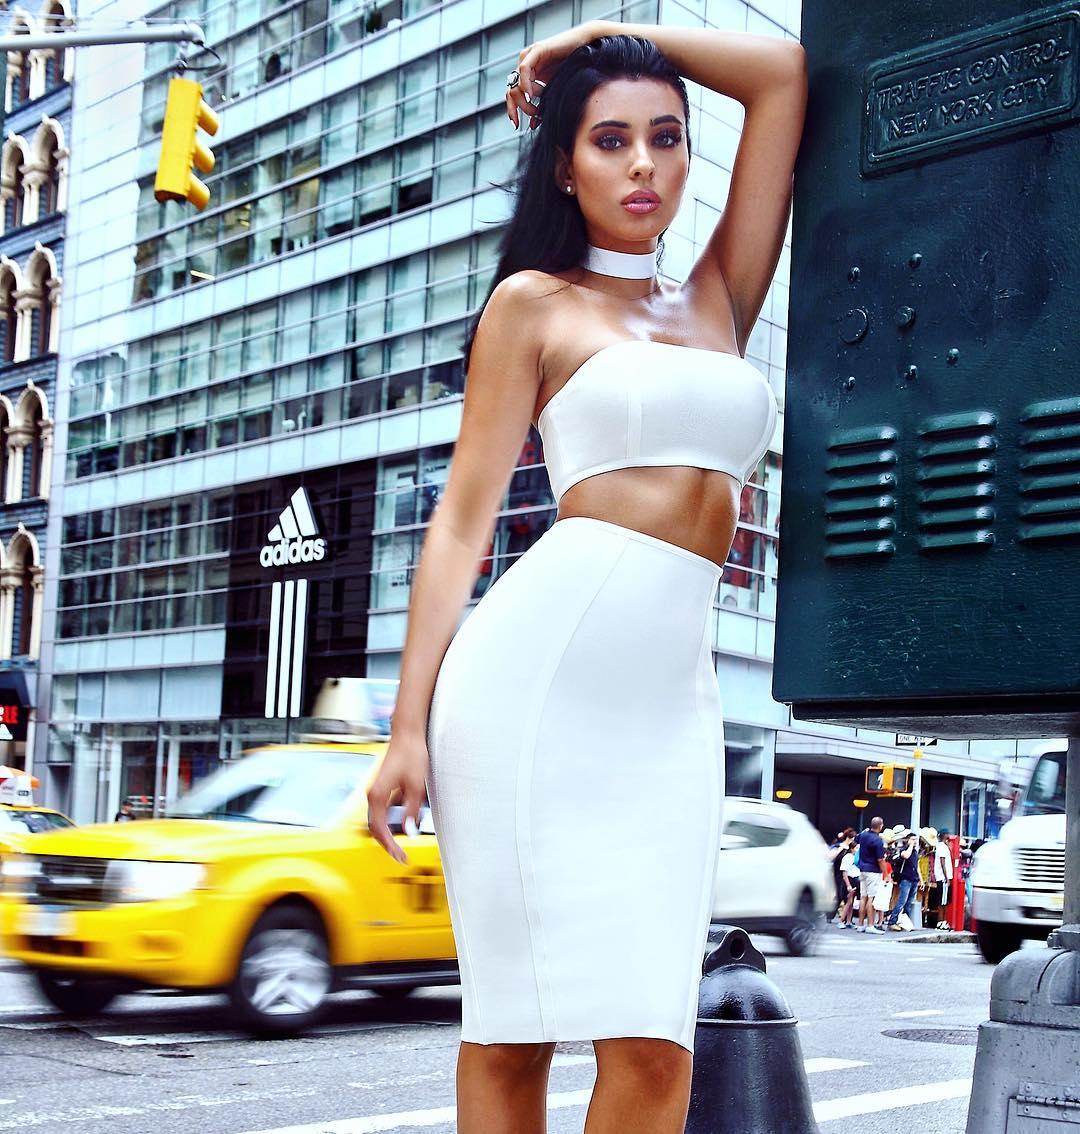 539e39155c8 choker twopiece whitedress dress nyc manhattan happybirthday LHHNY  beautiful shopping win stylegram. WHITE HOT!